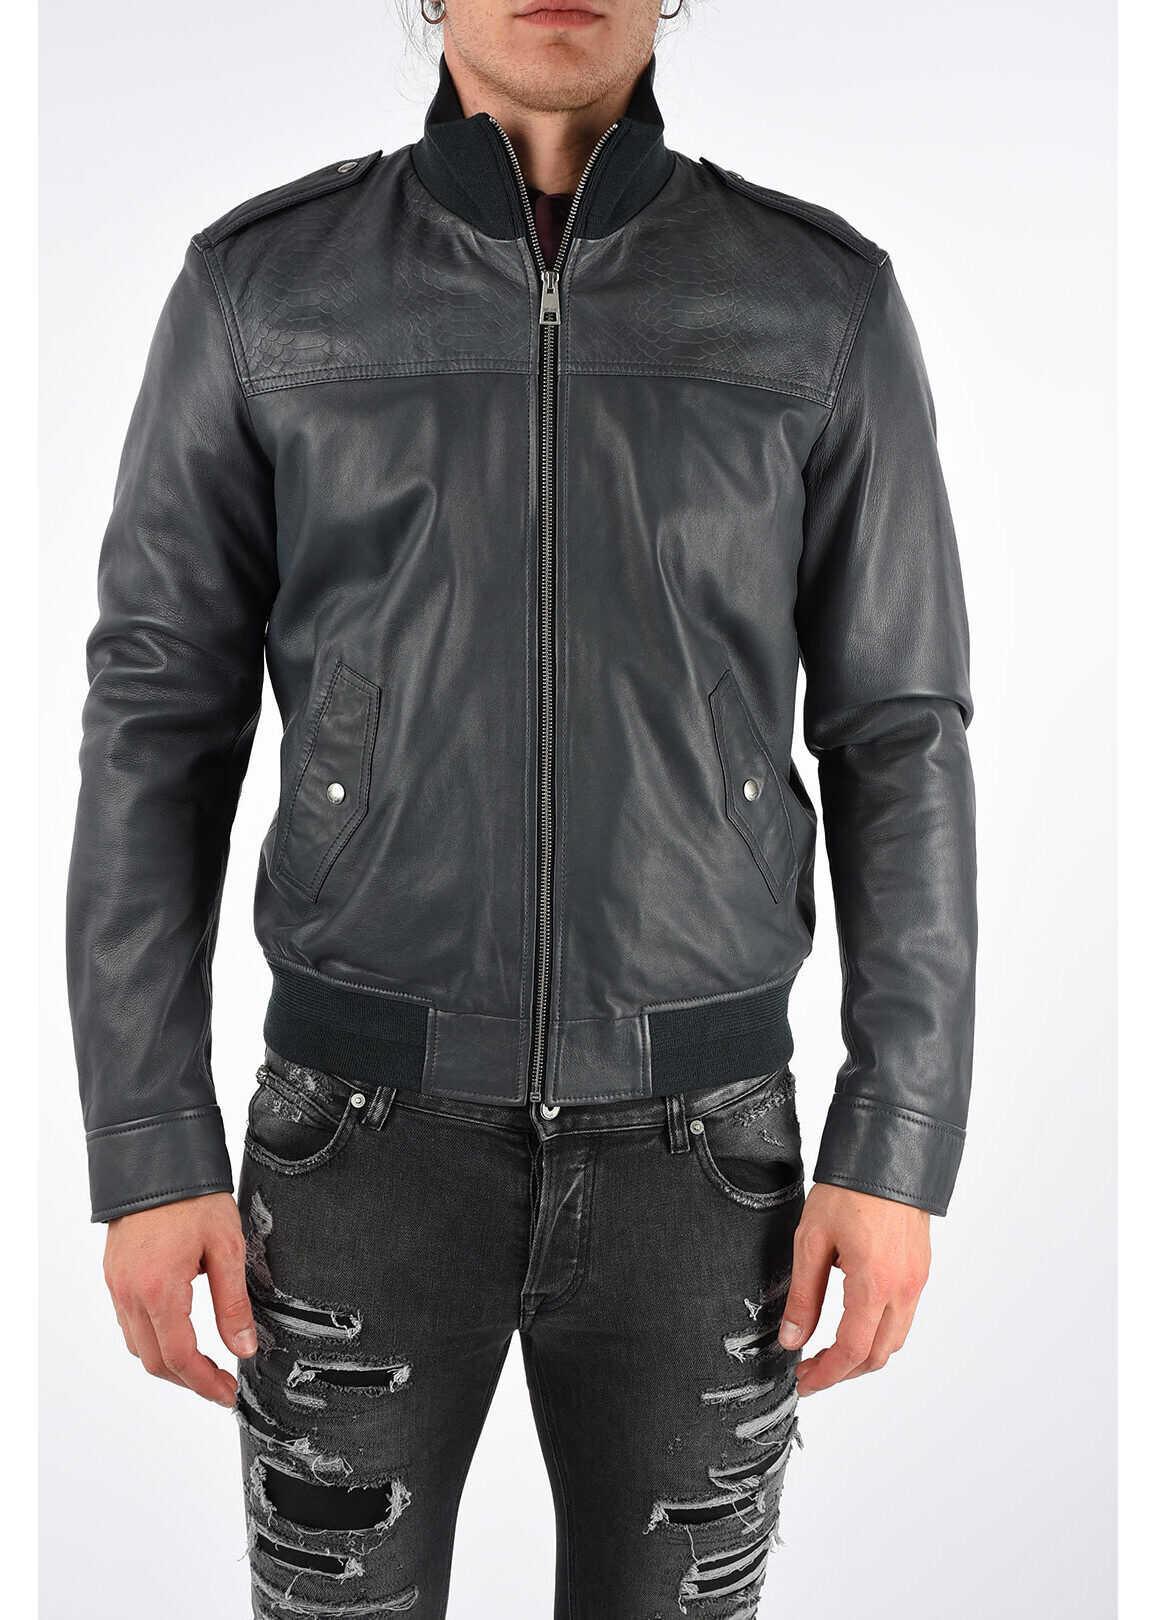 Just Cavalli Leather Bomber GRAY